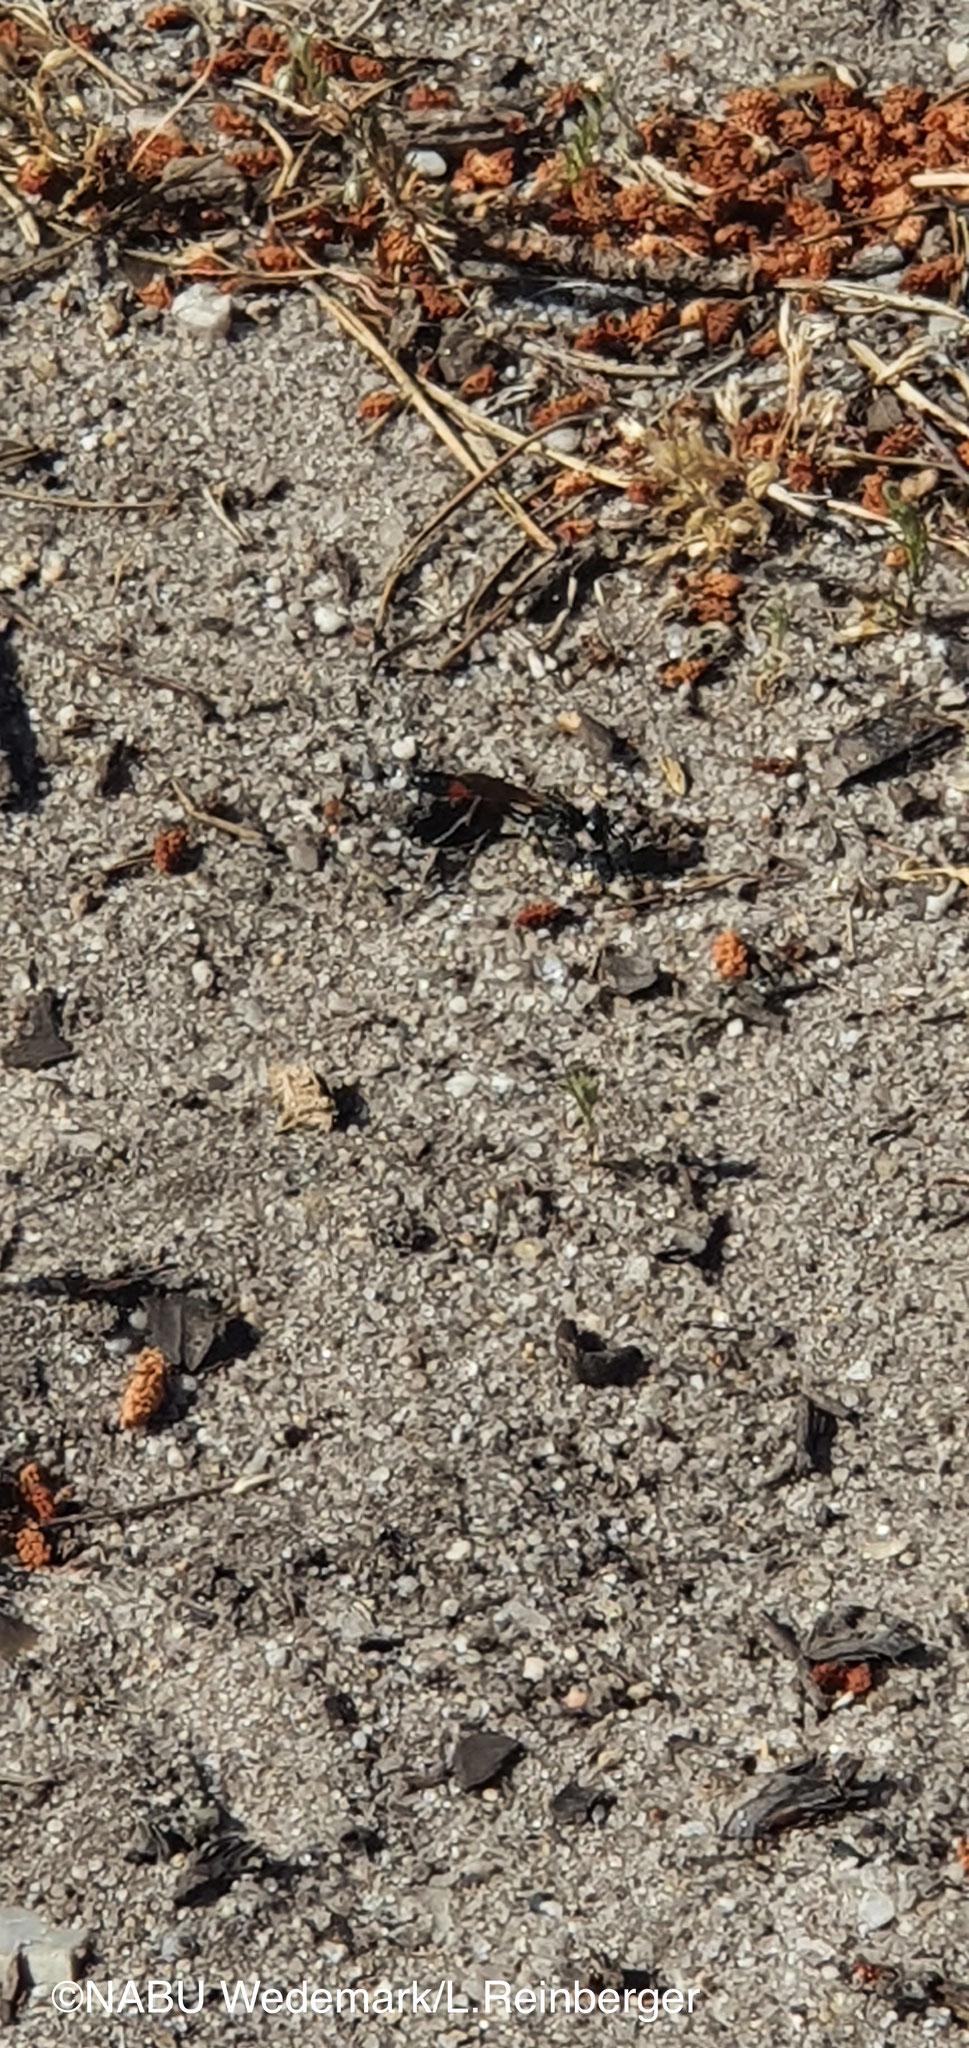 Wer findet die Sandwespe? Foto:NABU/L.Reinberger